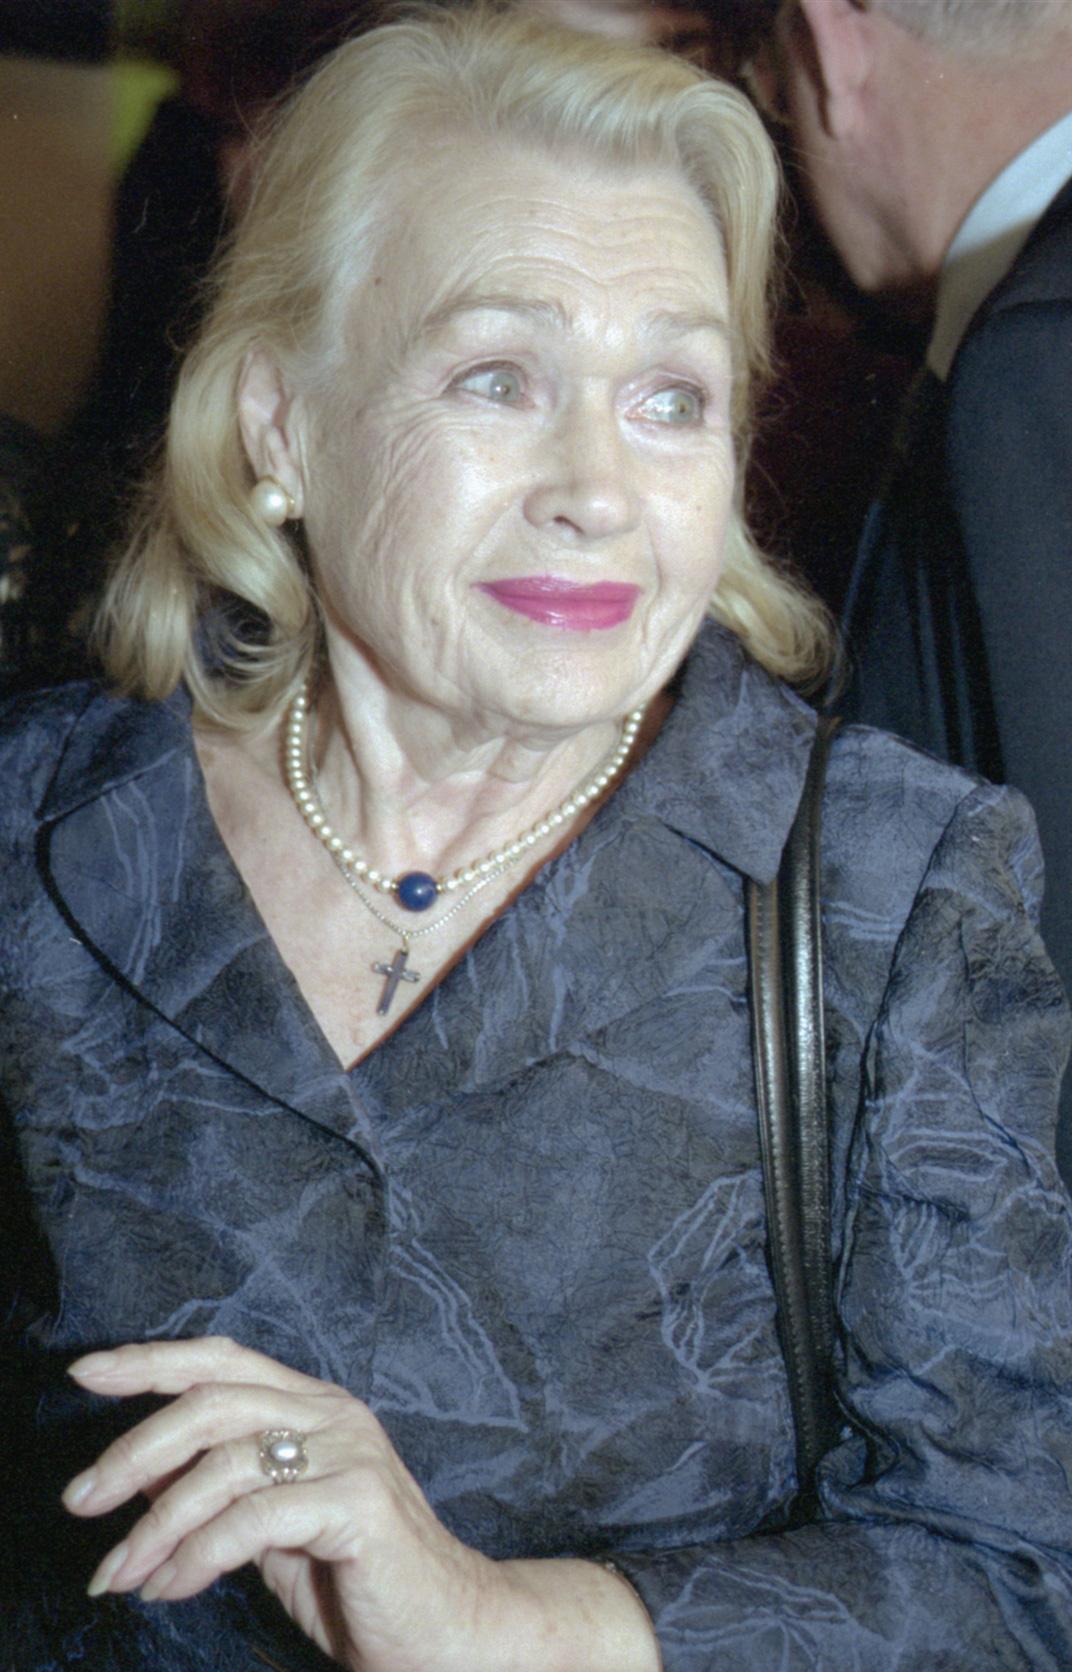 нина архипова актриса биография фото френч ногтях